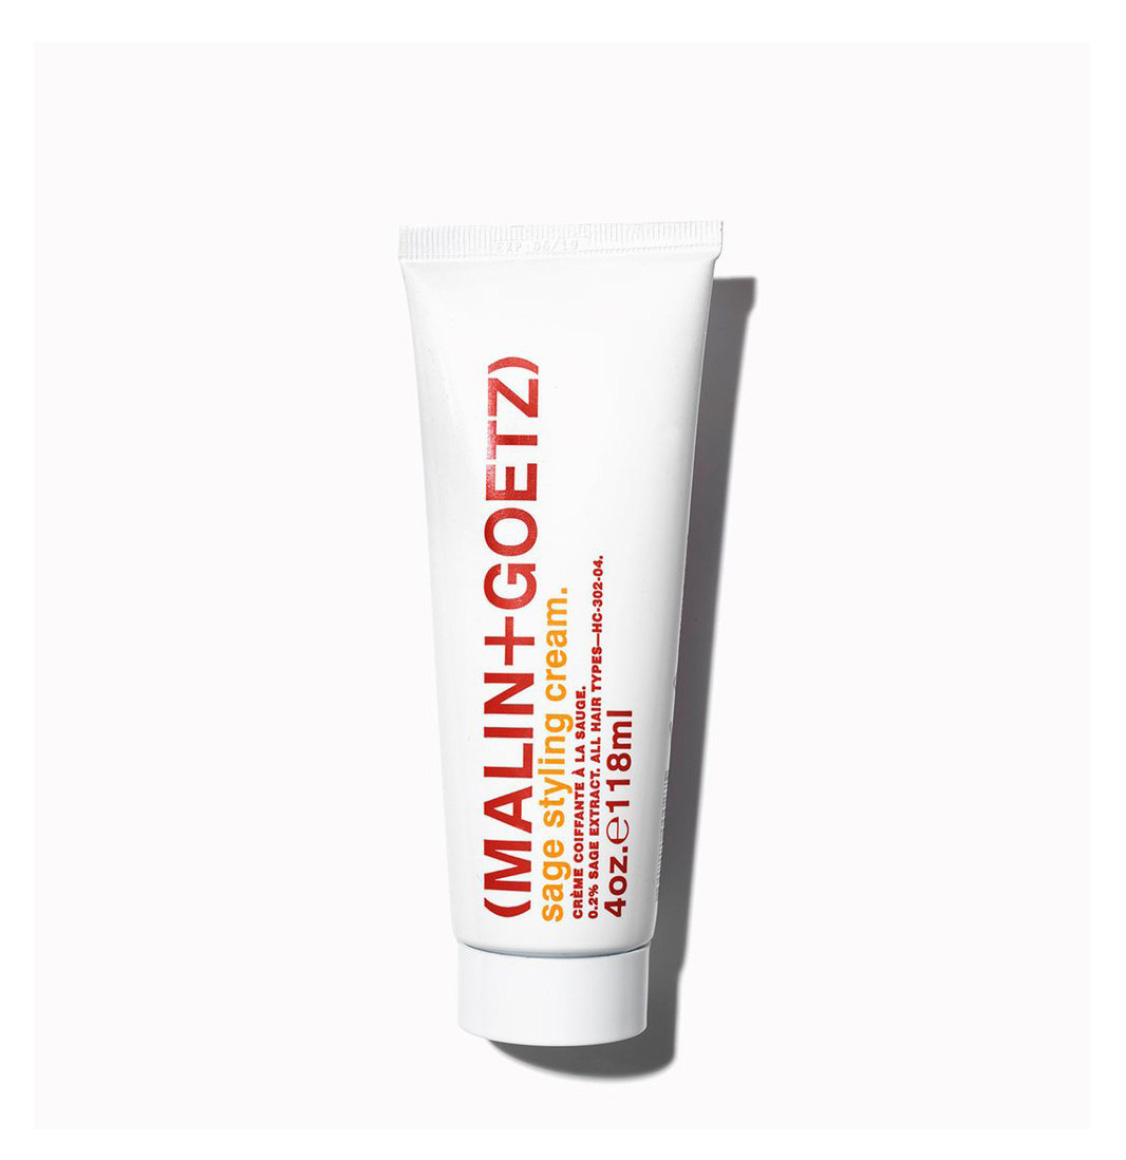 Malin and Goetz Sage Styling Cream 118g